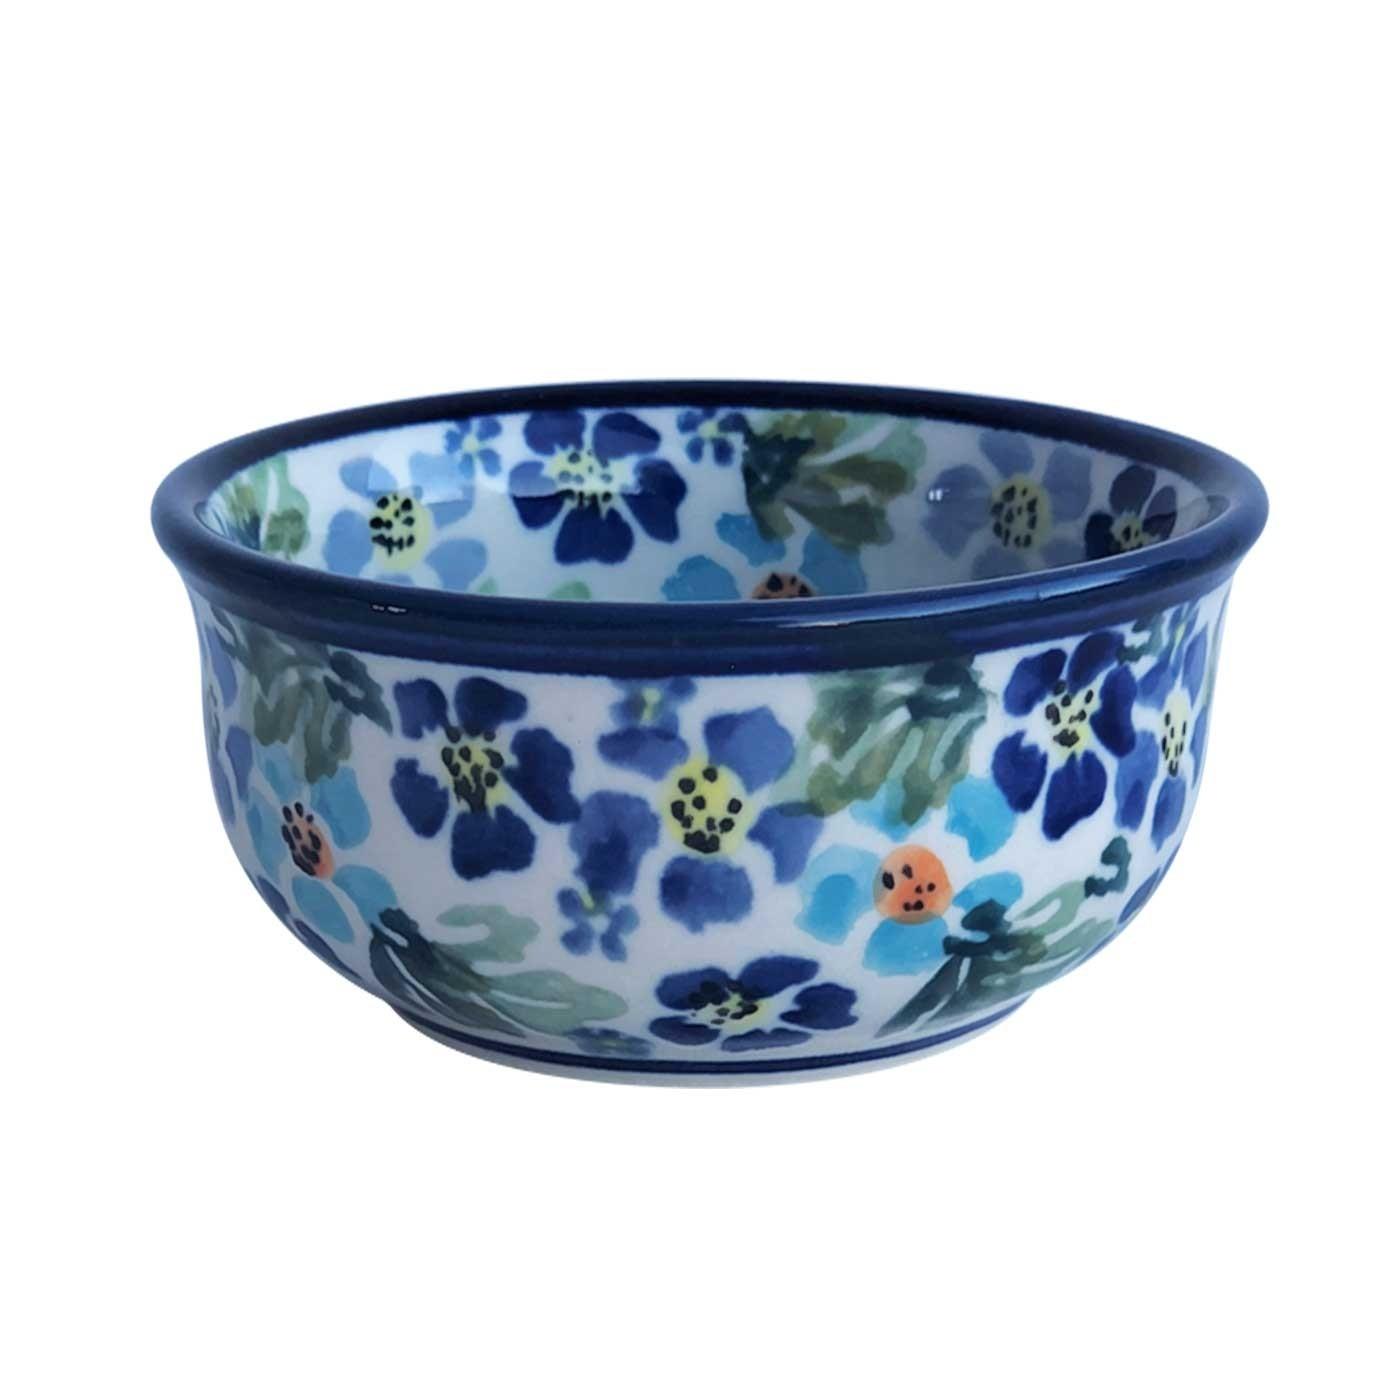 Pottery Avenue True Blues Small Stoneware Bowl